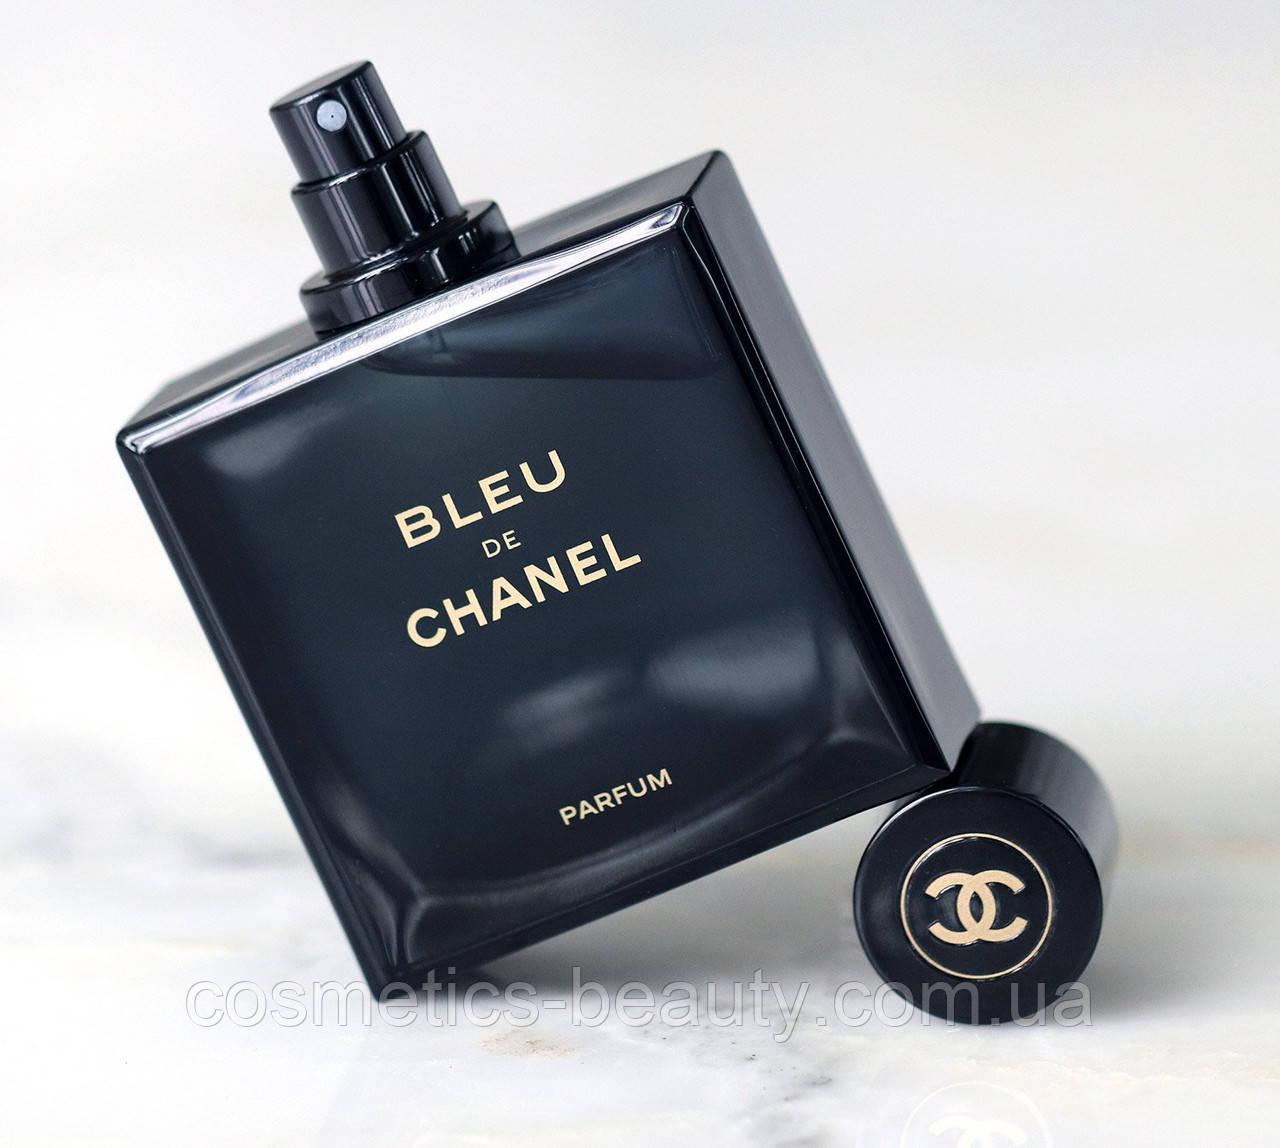 Мужская туалетная вода Chanel Bleu de Chanel (тестер).